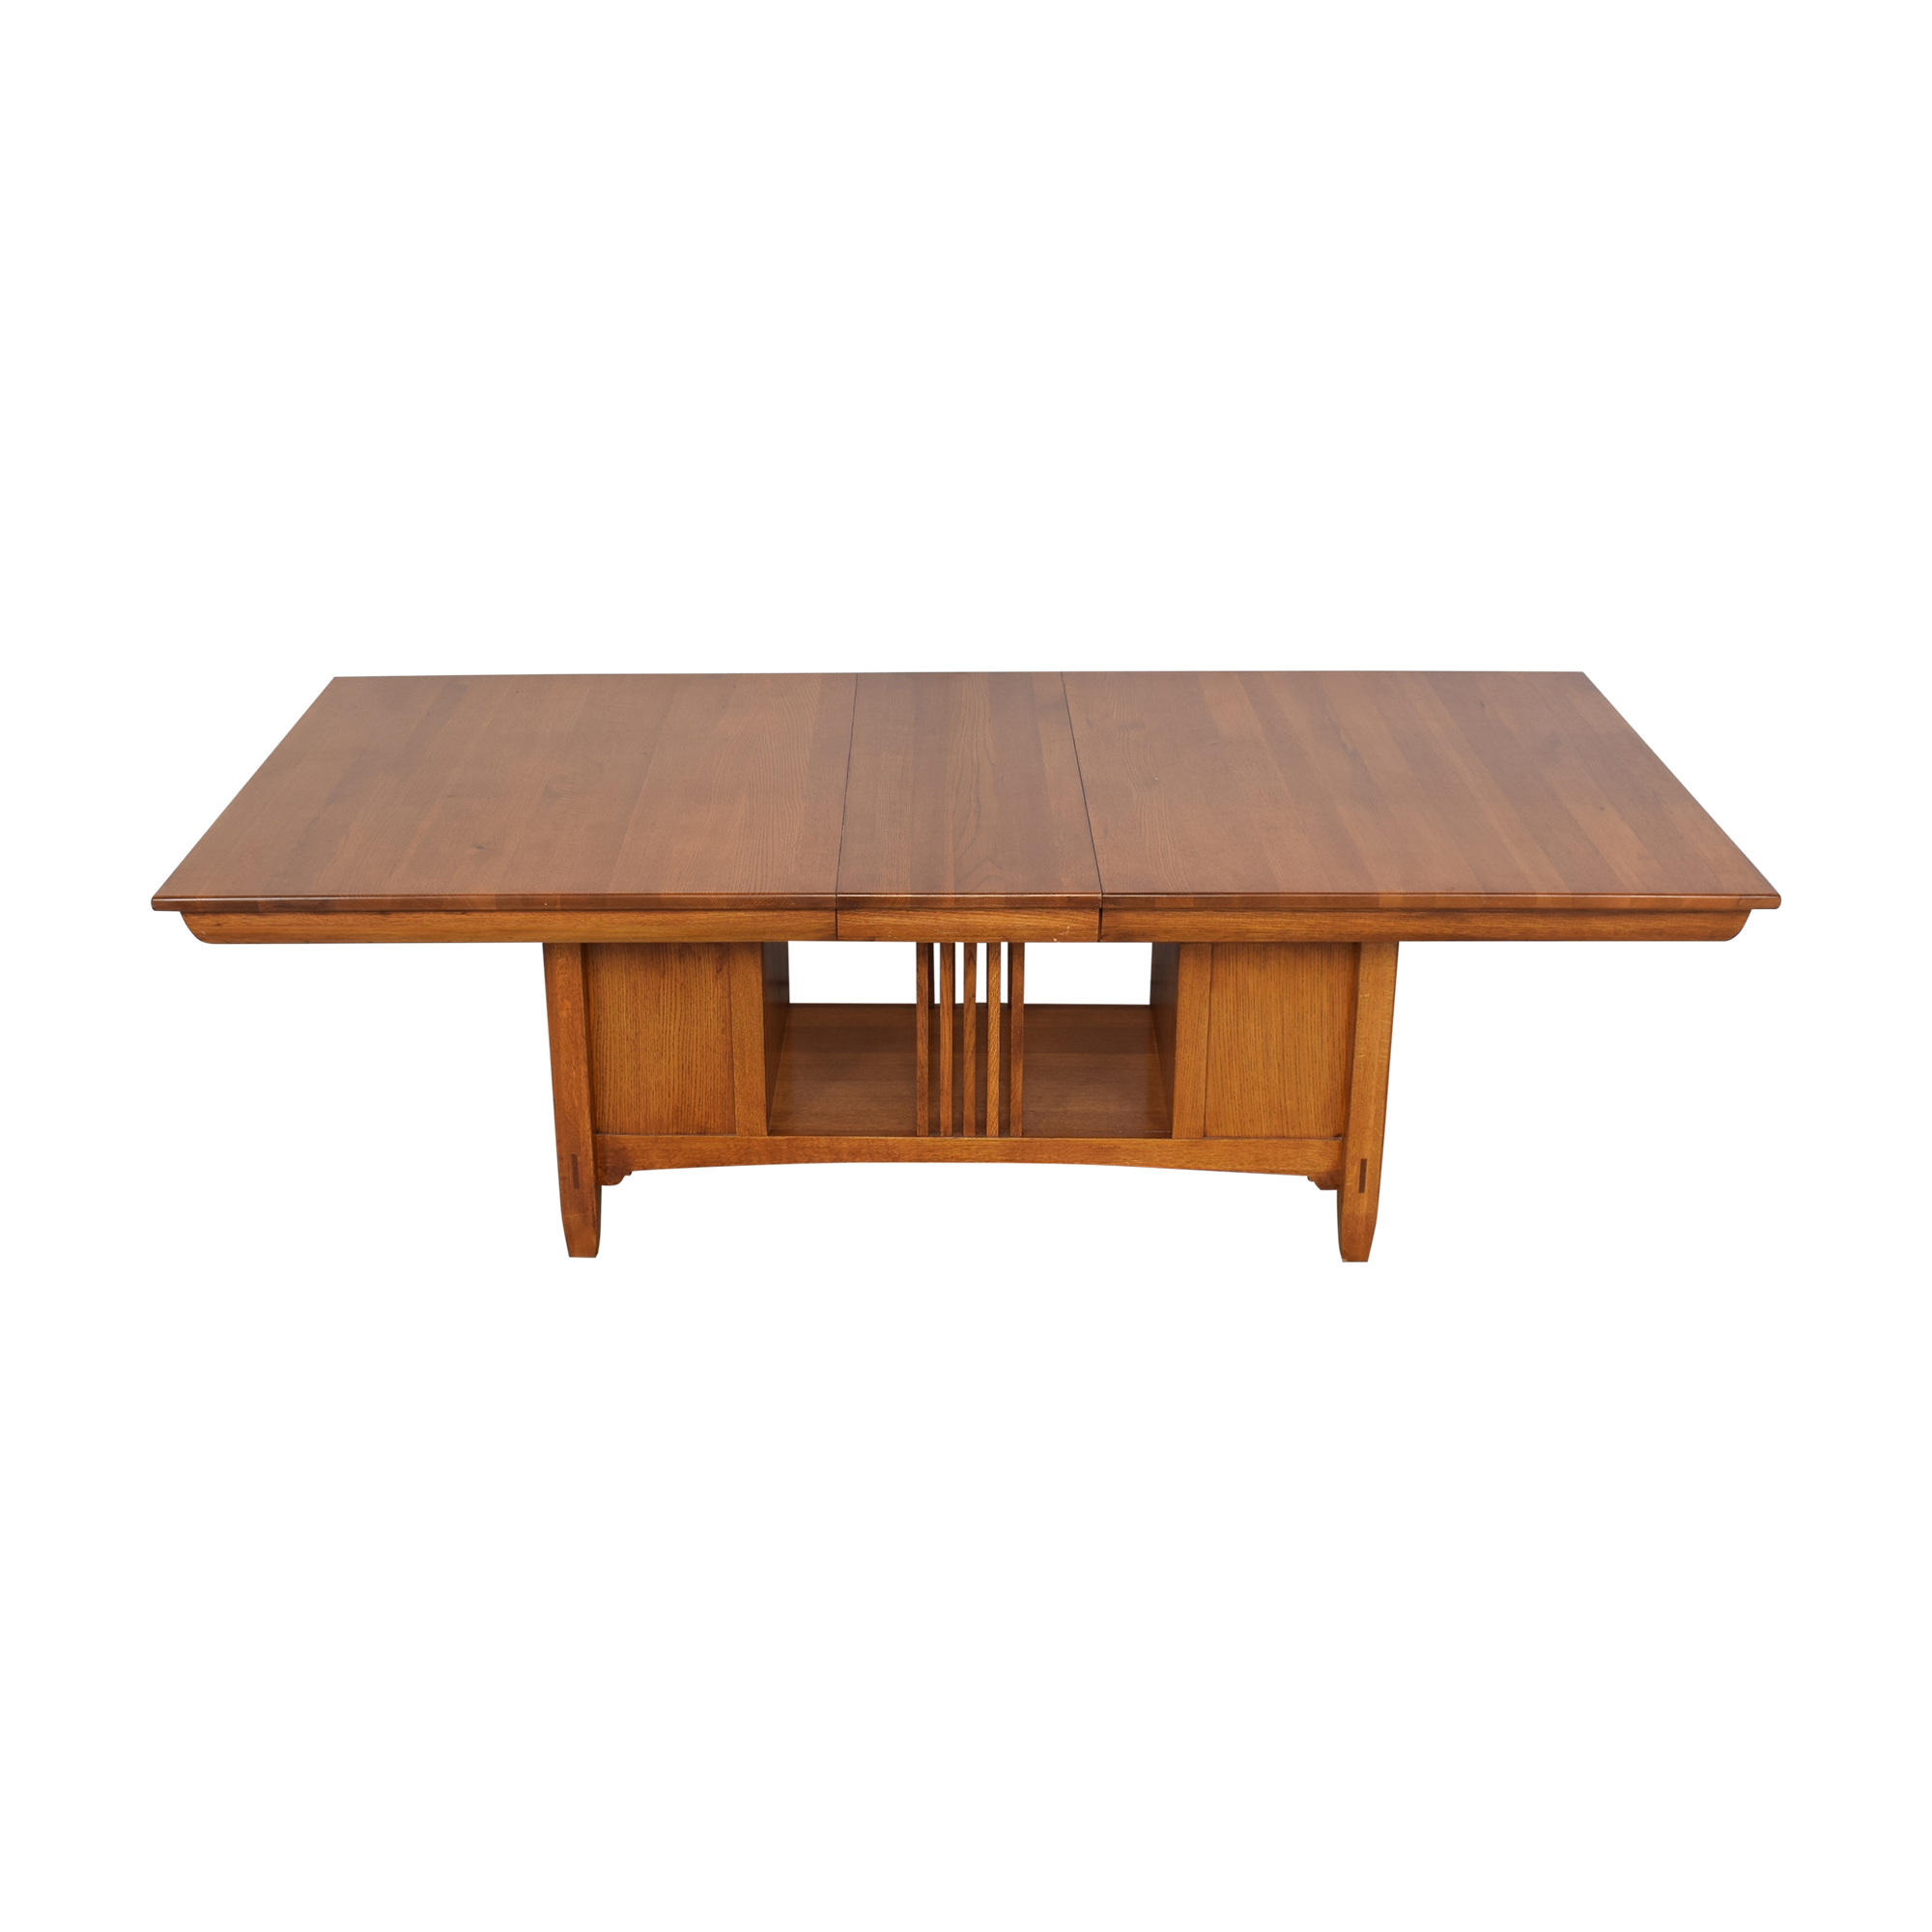 Lexington Furniture Lexington Bob Timberlake Arts & Crafts Collection Storage Dining Table dimensions